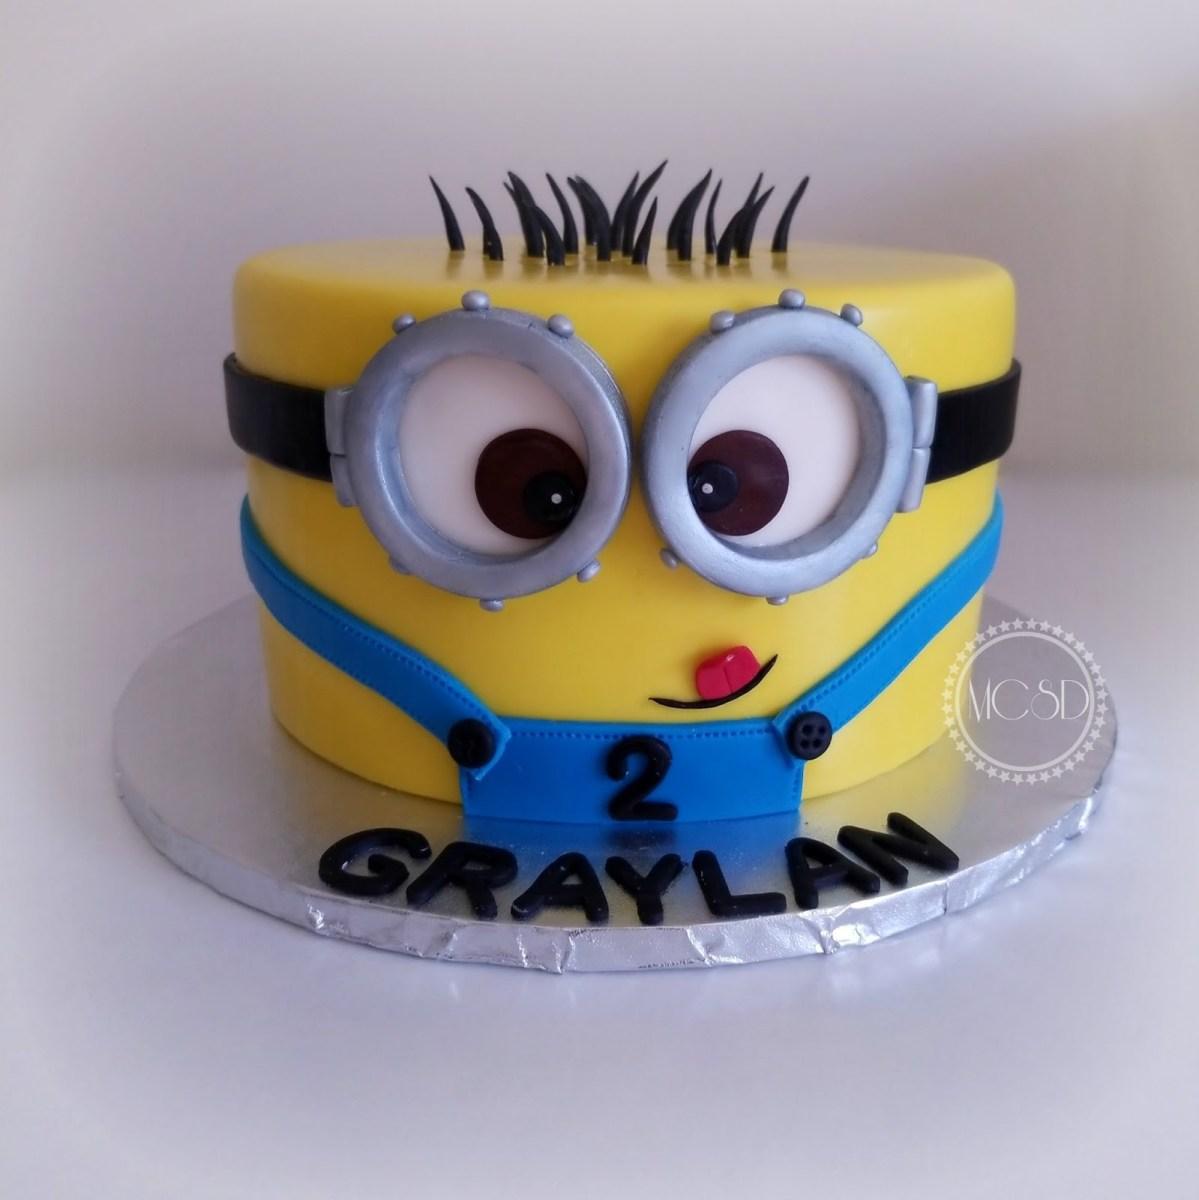 Marvelous Minion Birthday Cake Images Mycakesweetdreams Minion Birthday Cake Funny Birthday Cards Online Unhofree Goldxyz